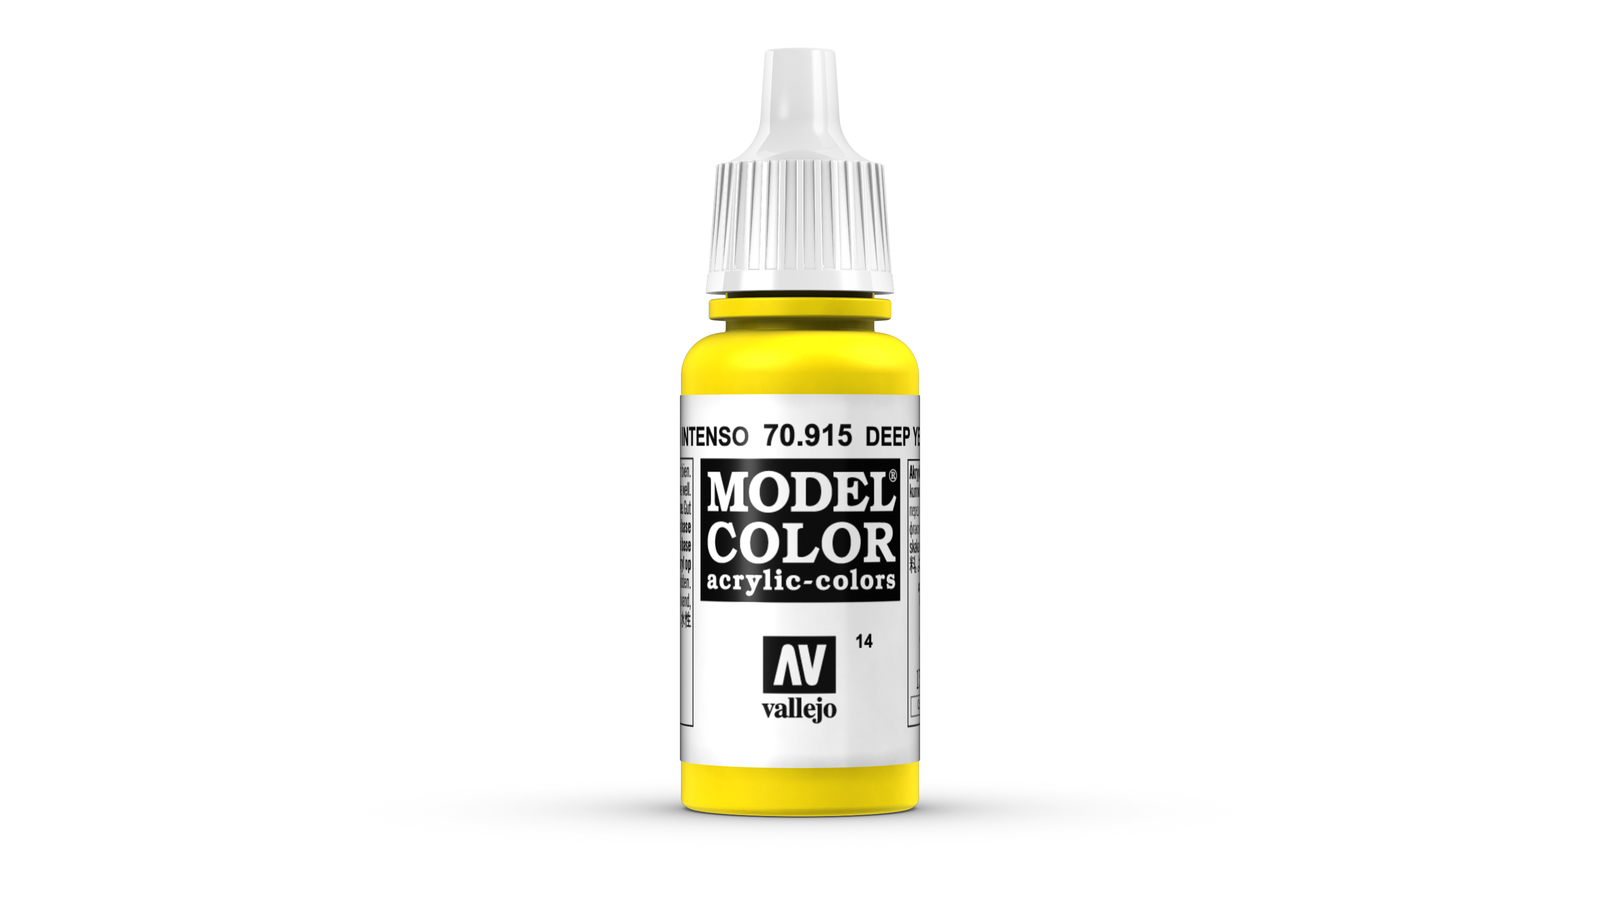 Vallejo Model Colour Deep Yellow 17ml image